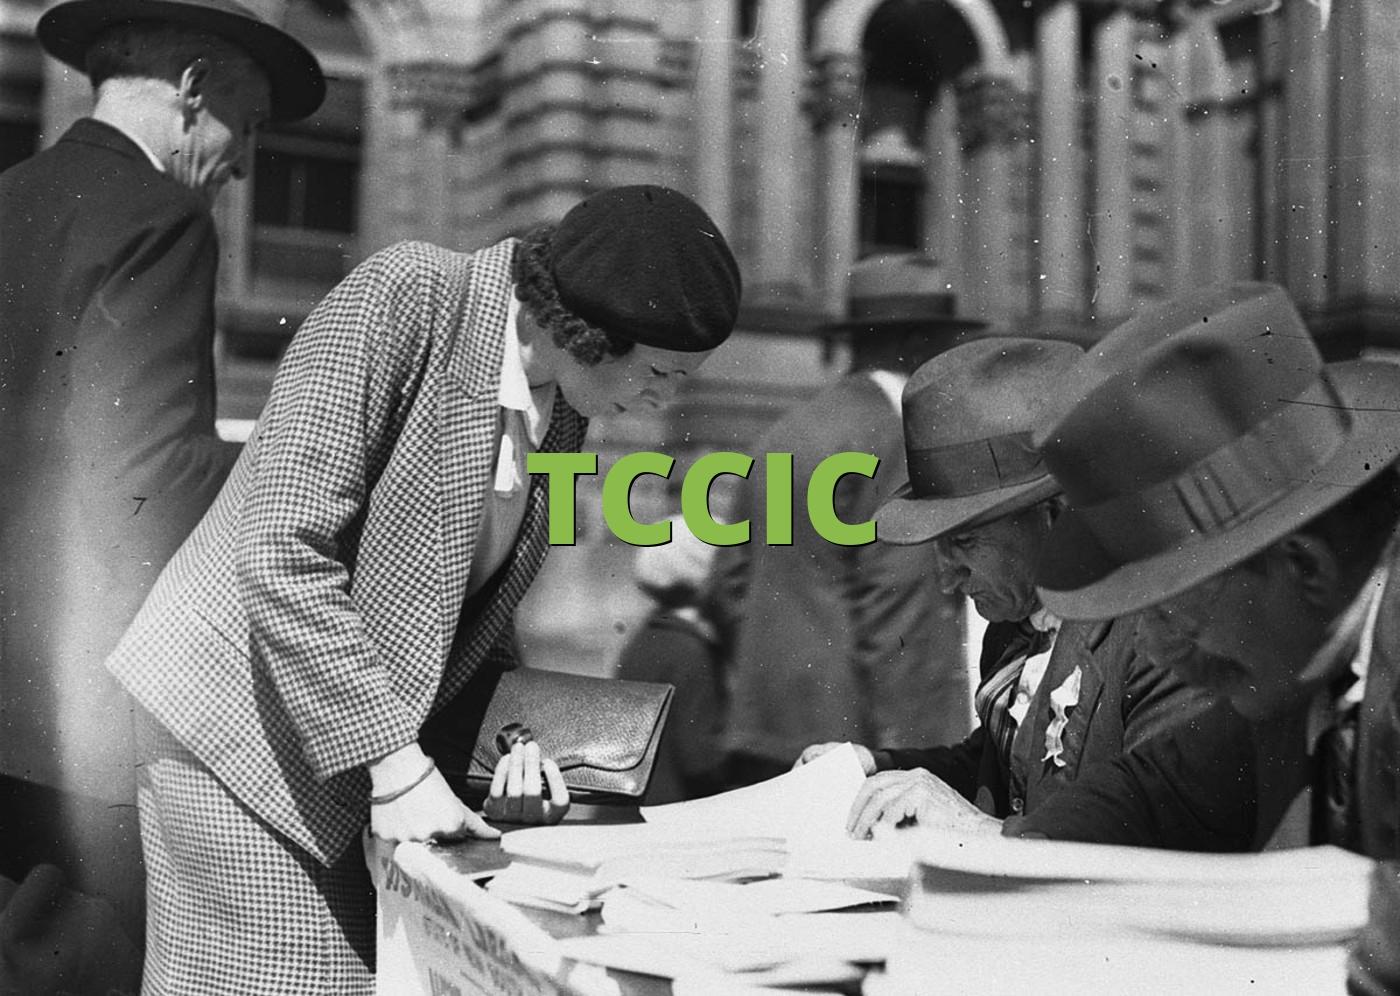 TCCIC